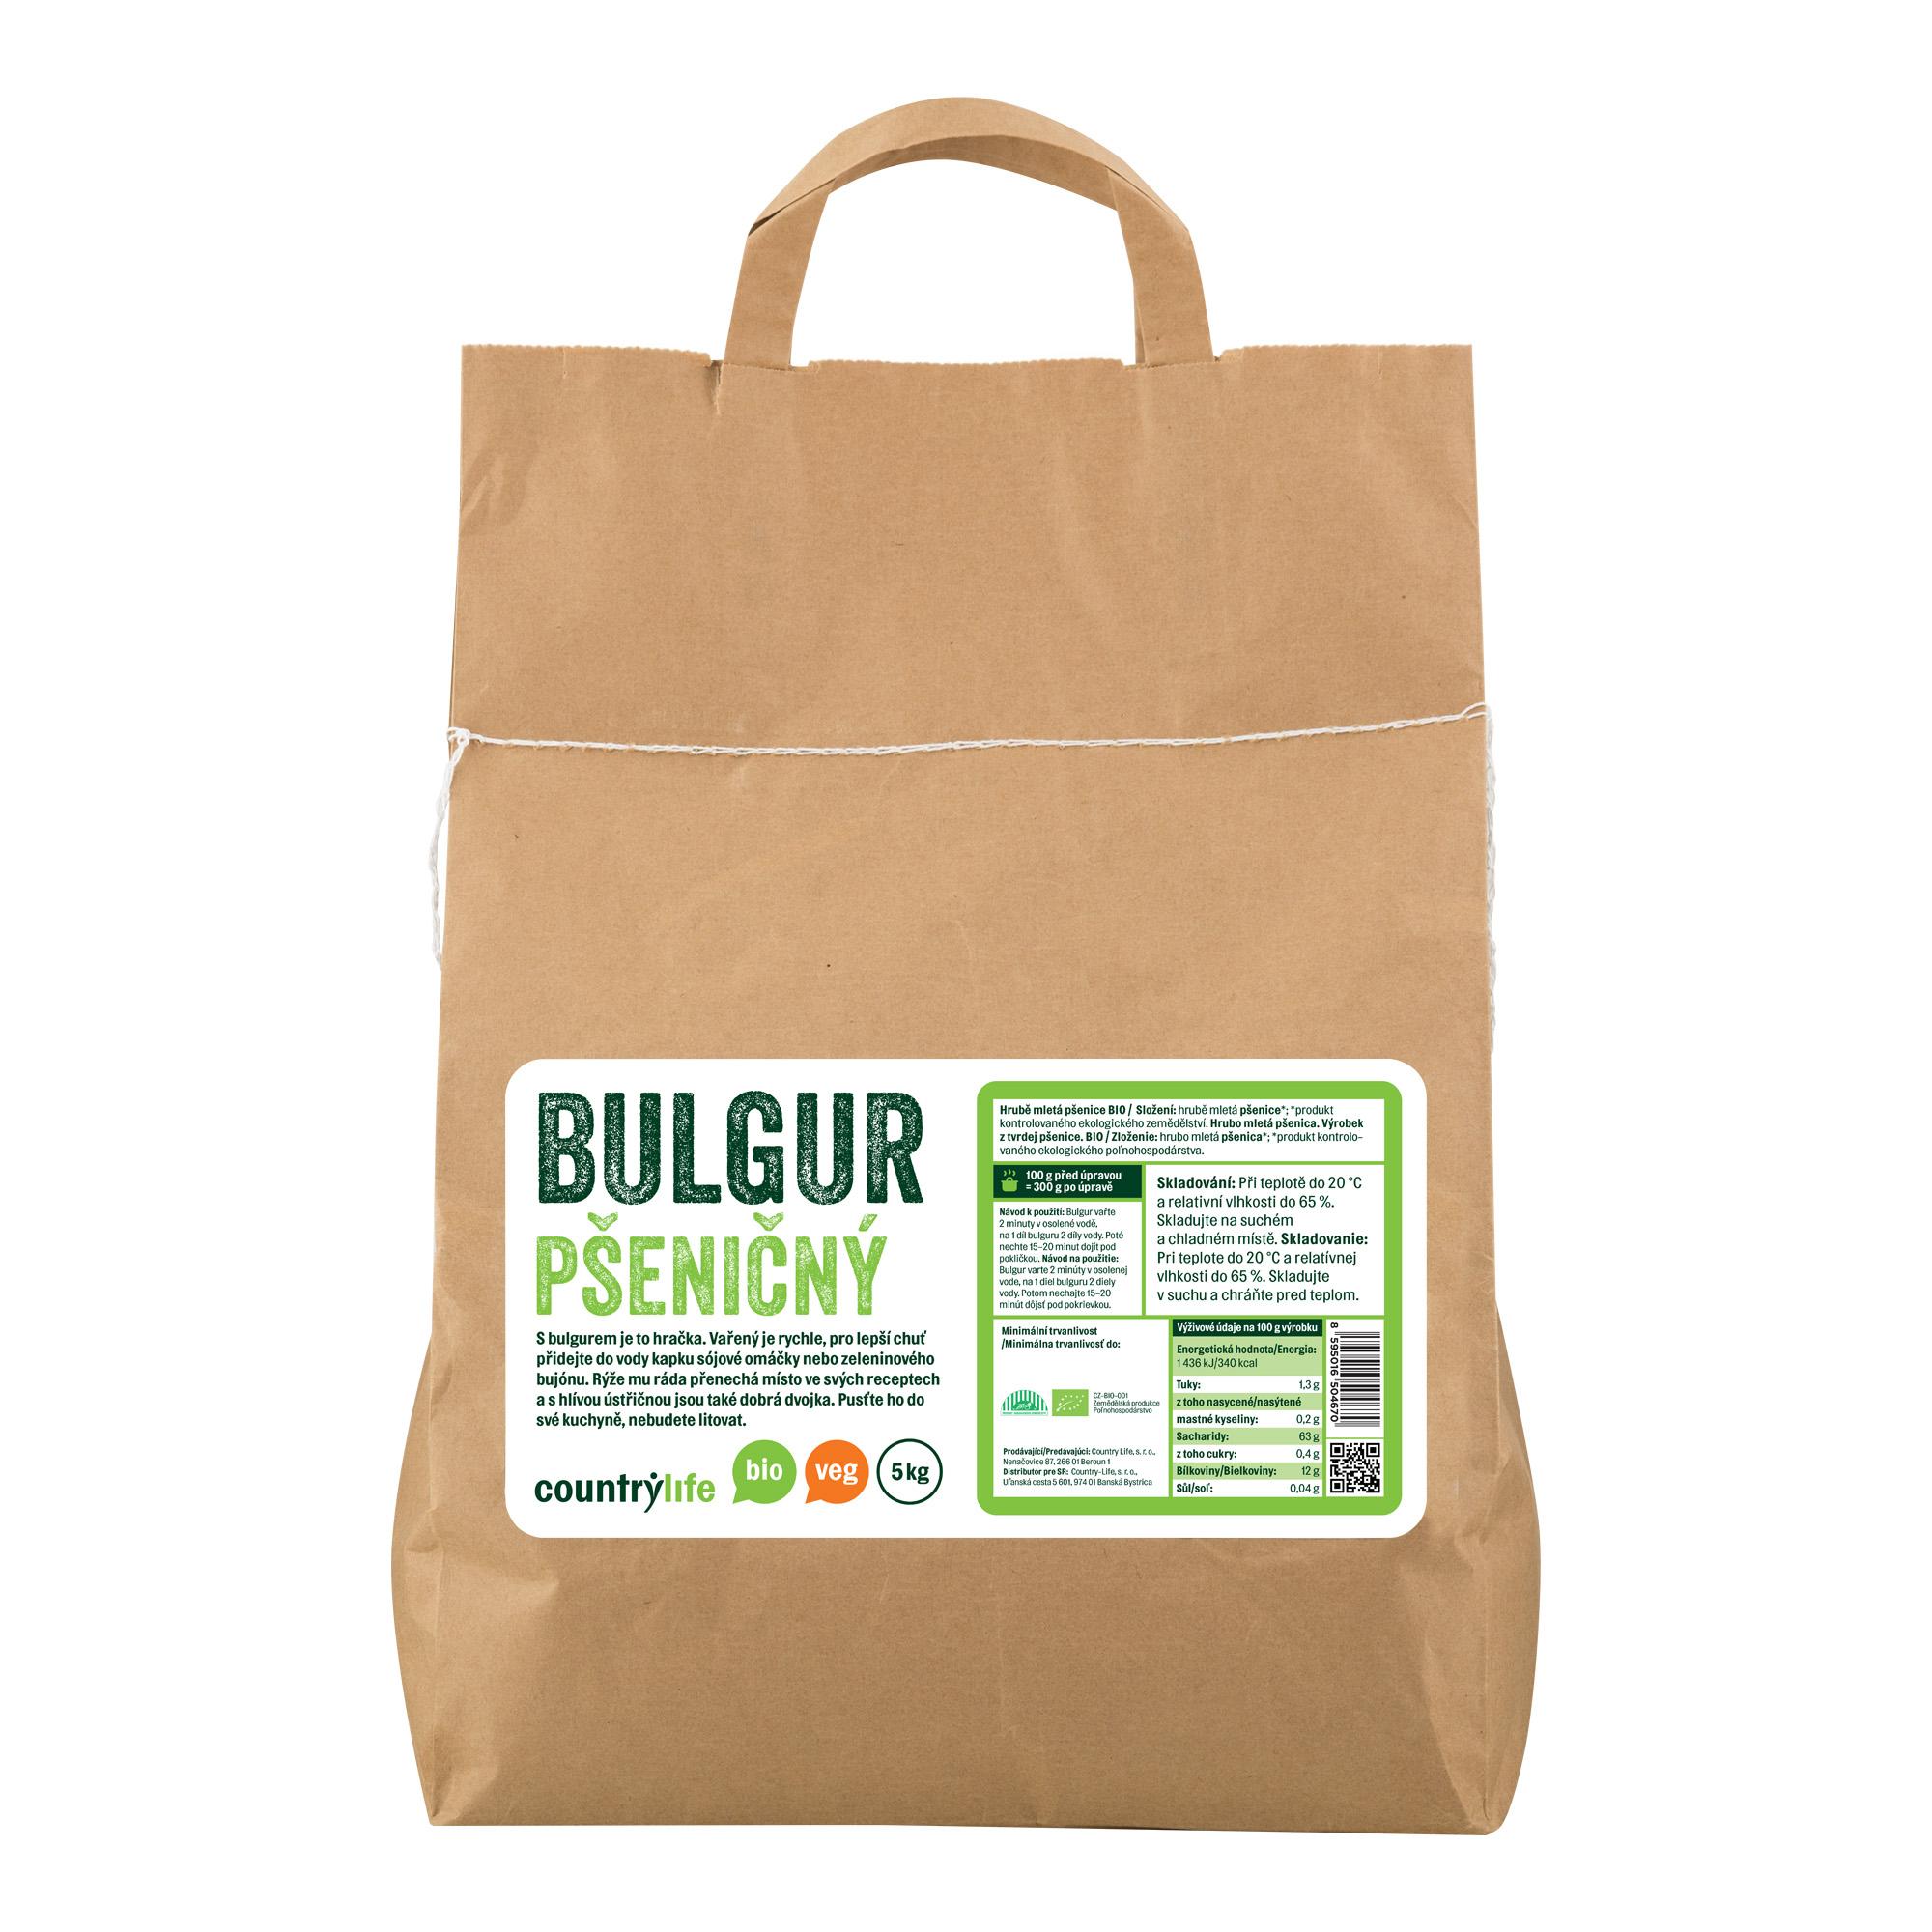 Bulgur pšeničný 5kg BIO   COUNTRYLIFE